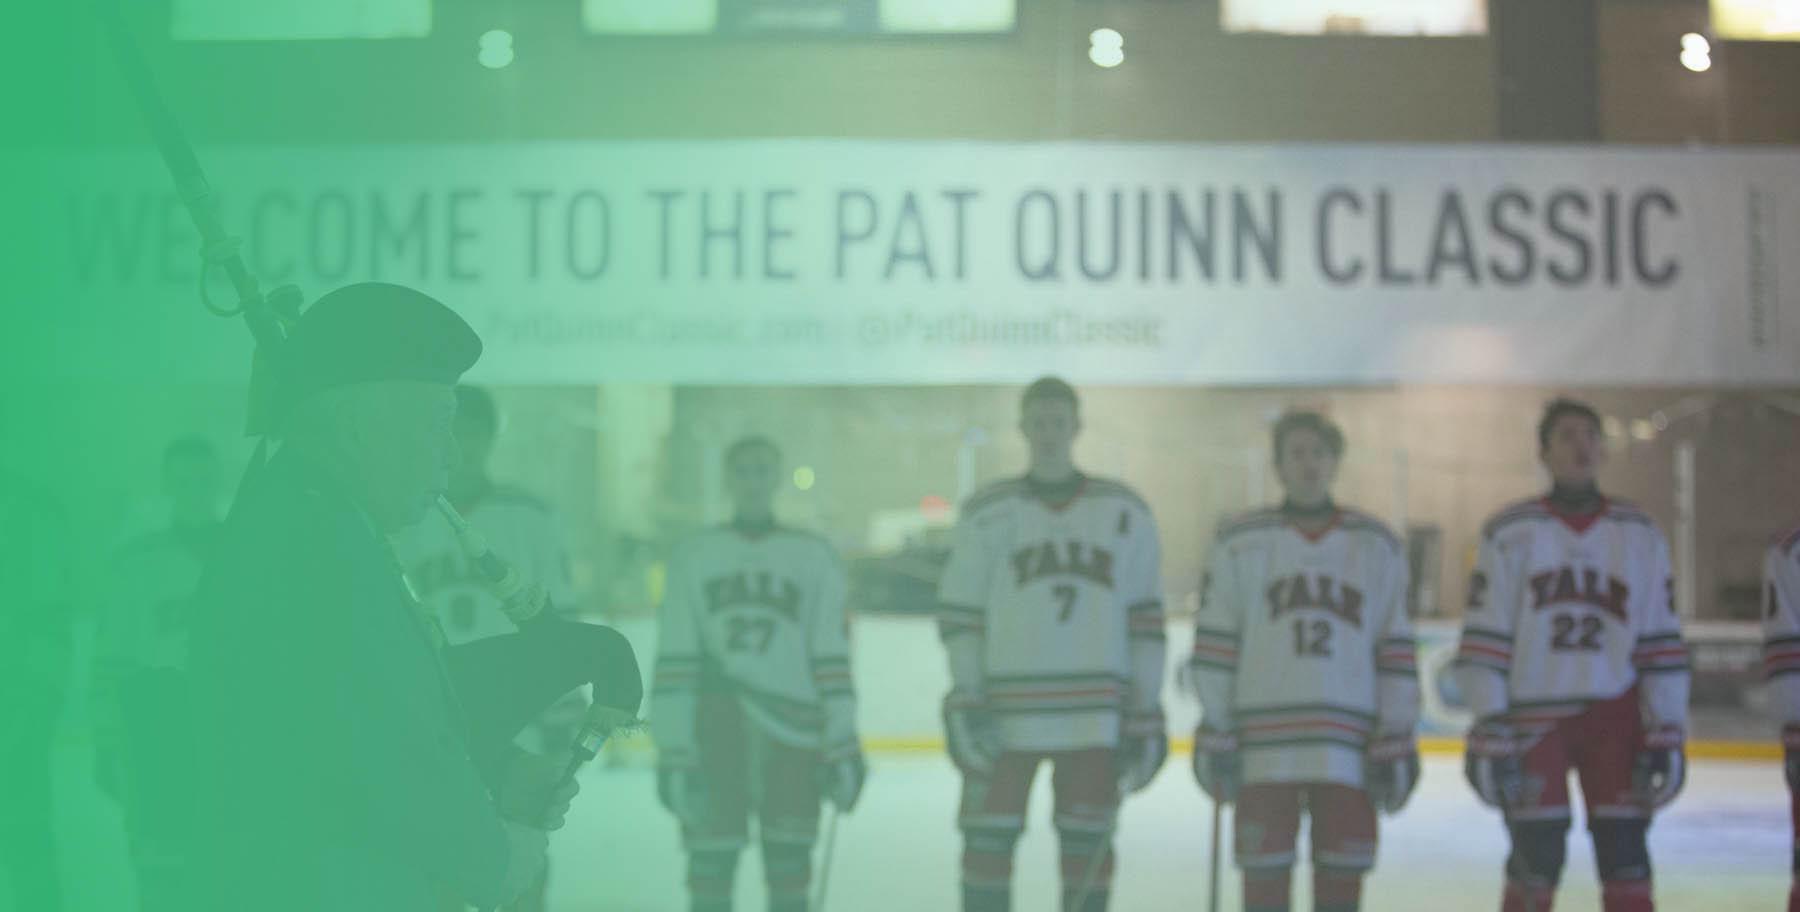 Pat Quinn Classic 2020 | Burnaby, B.C. Canada